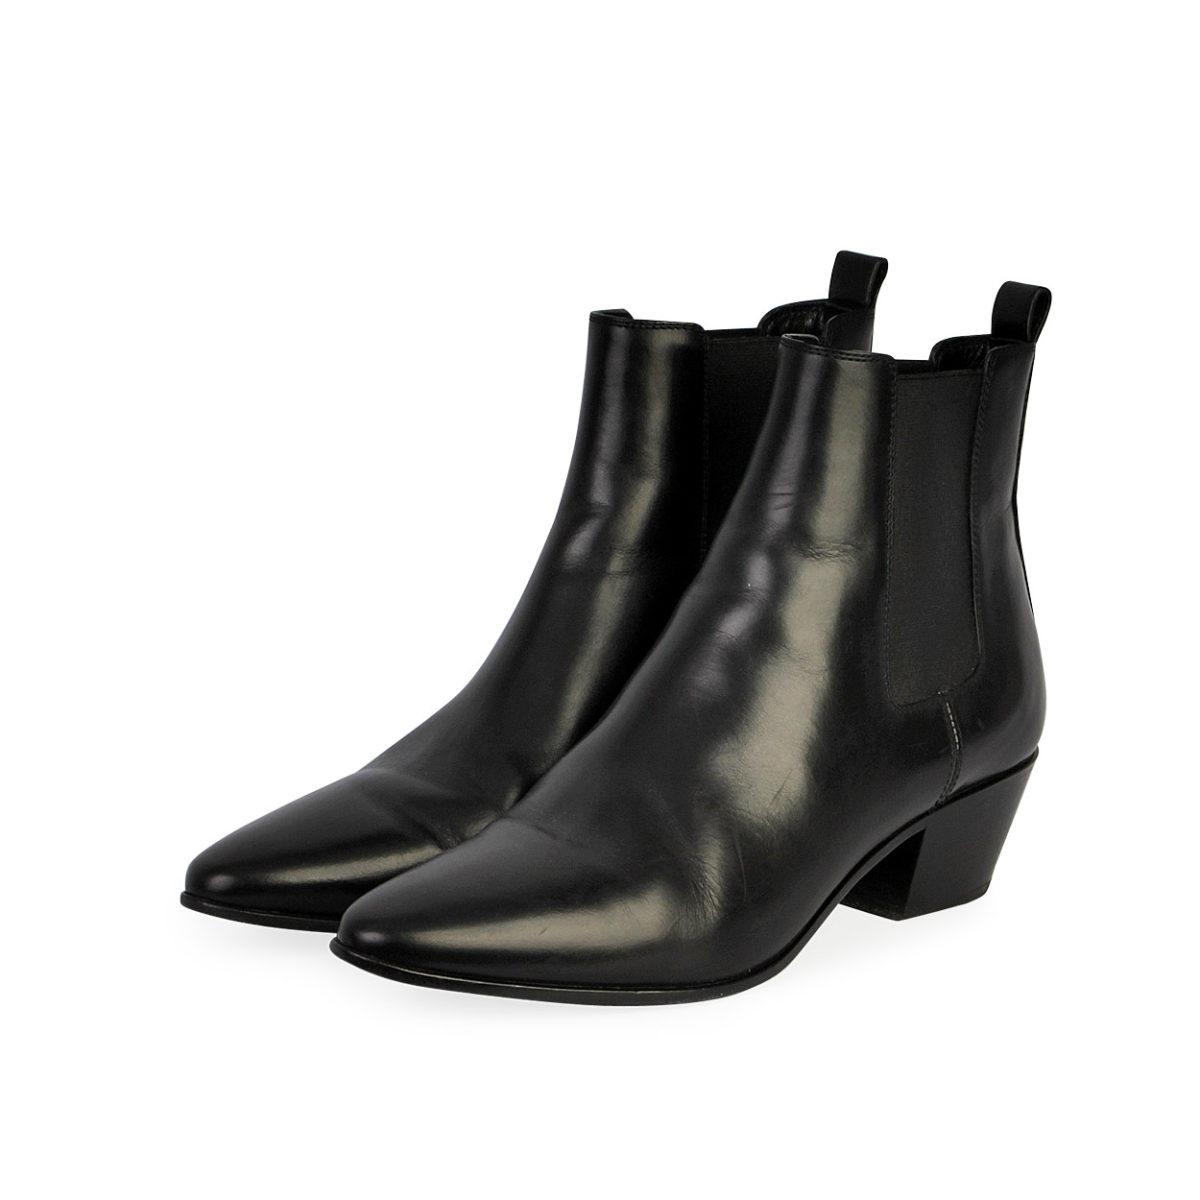 YVES SAINT LAURENT Leather Chelsea Ankle Boots Black , S 39.5 (6.5)